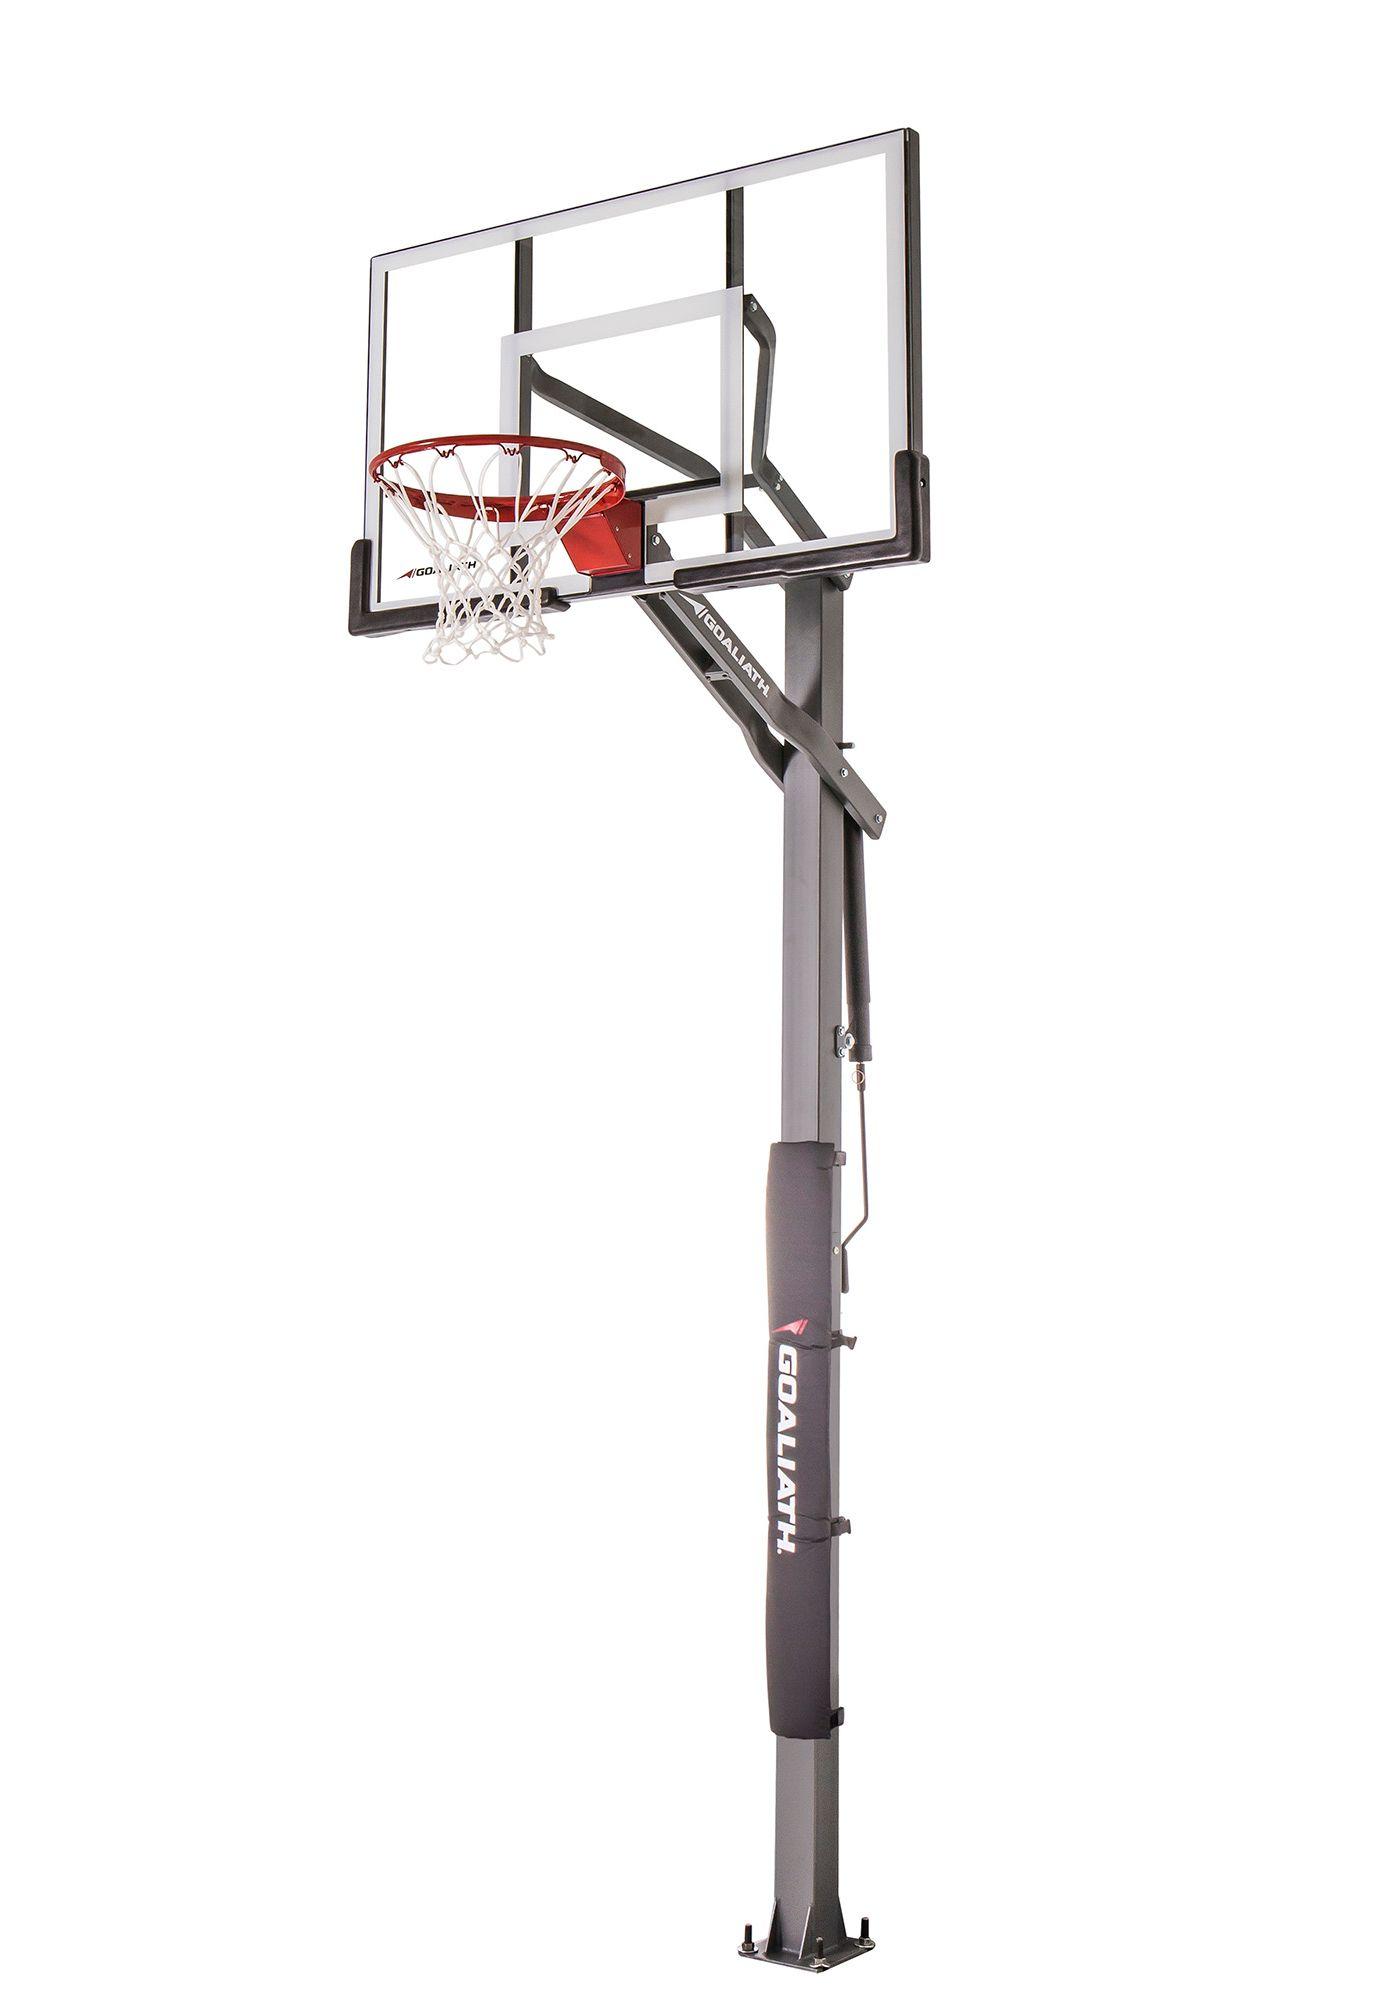 Goaliath 54'' Prodigy In-Ground Basketball Hoop